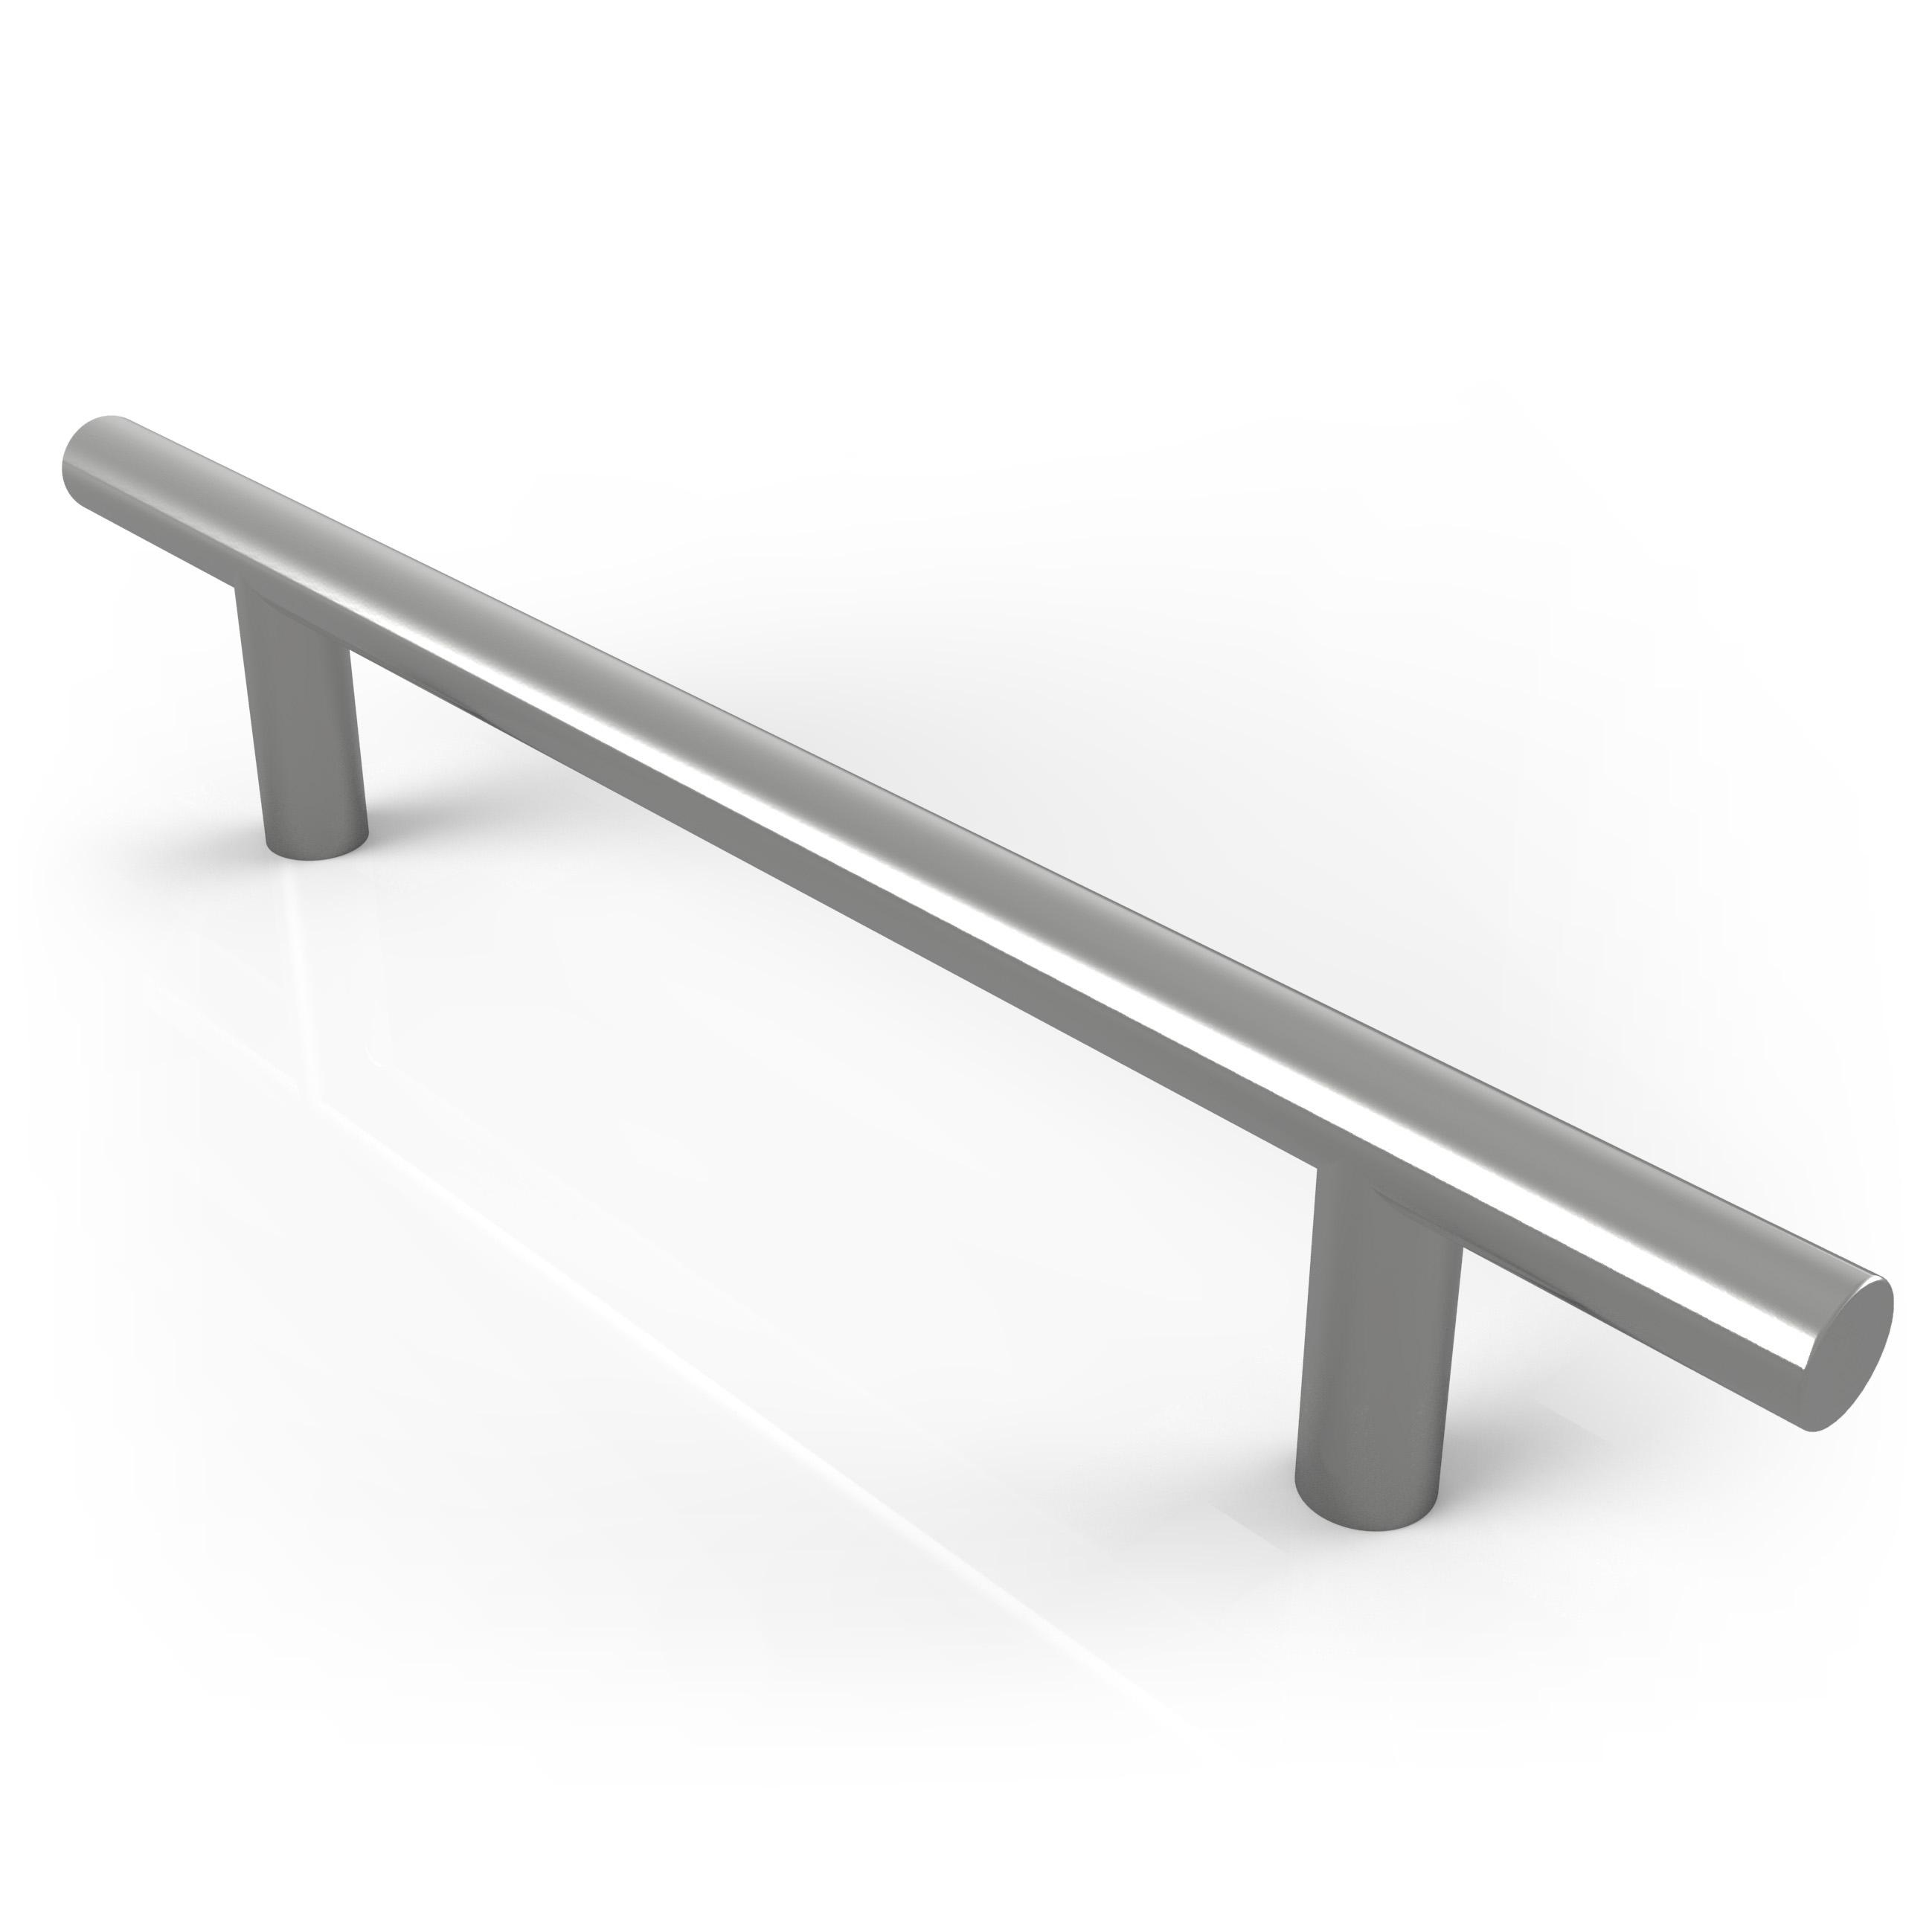 Luxury Stainless Steel Bar Pull Handles